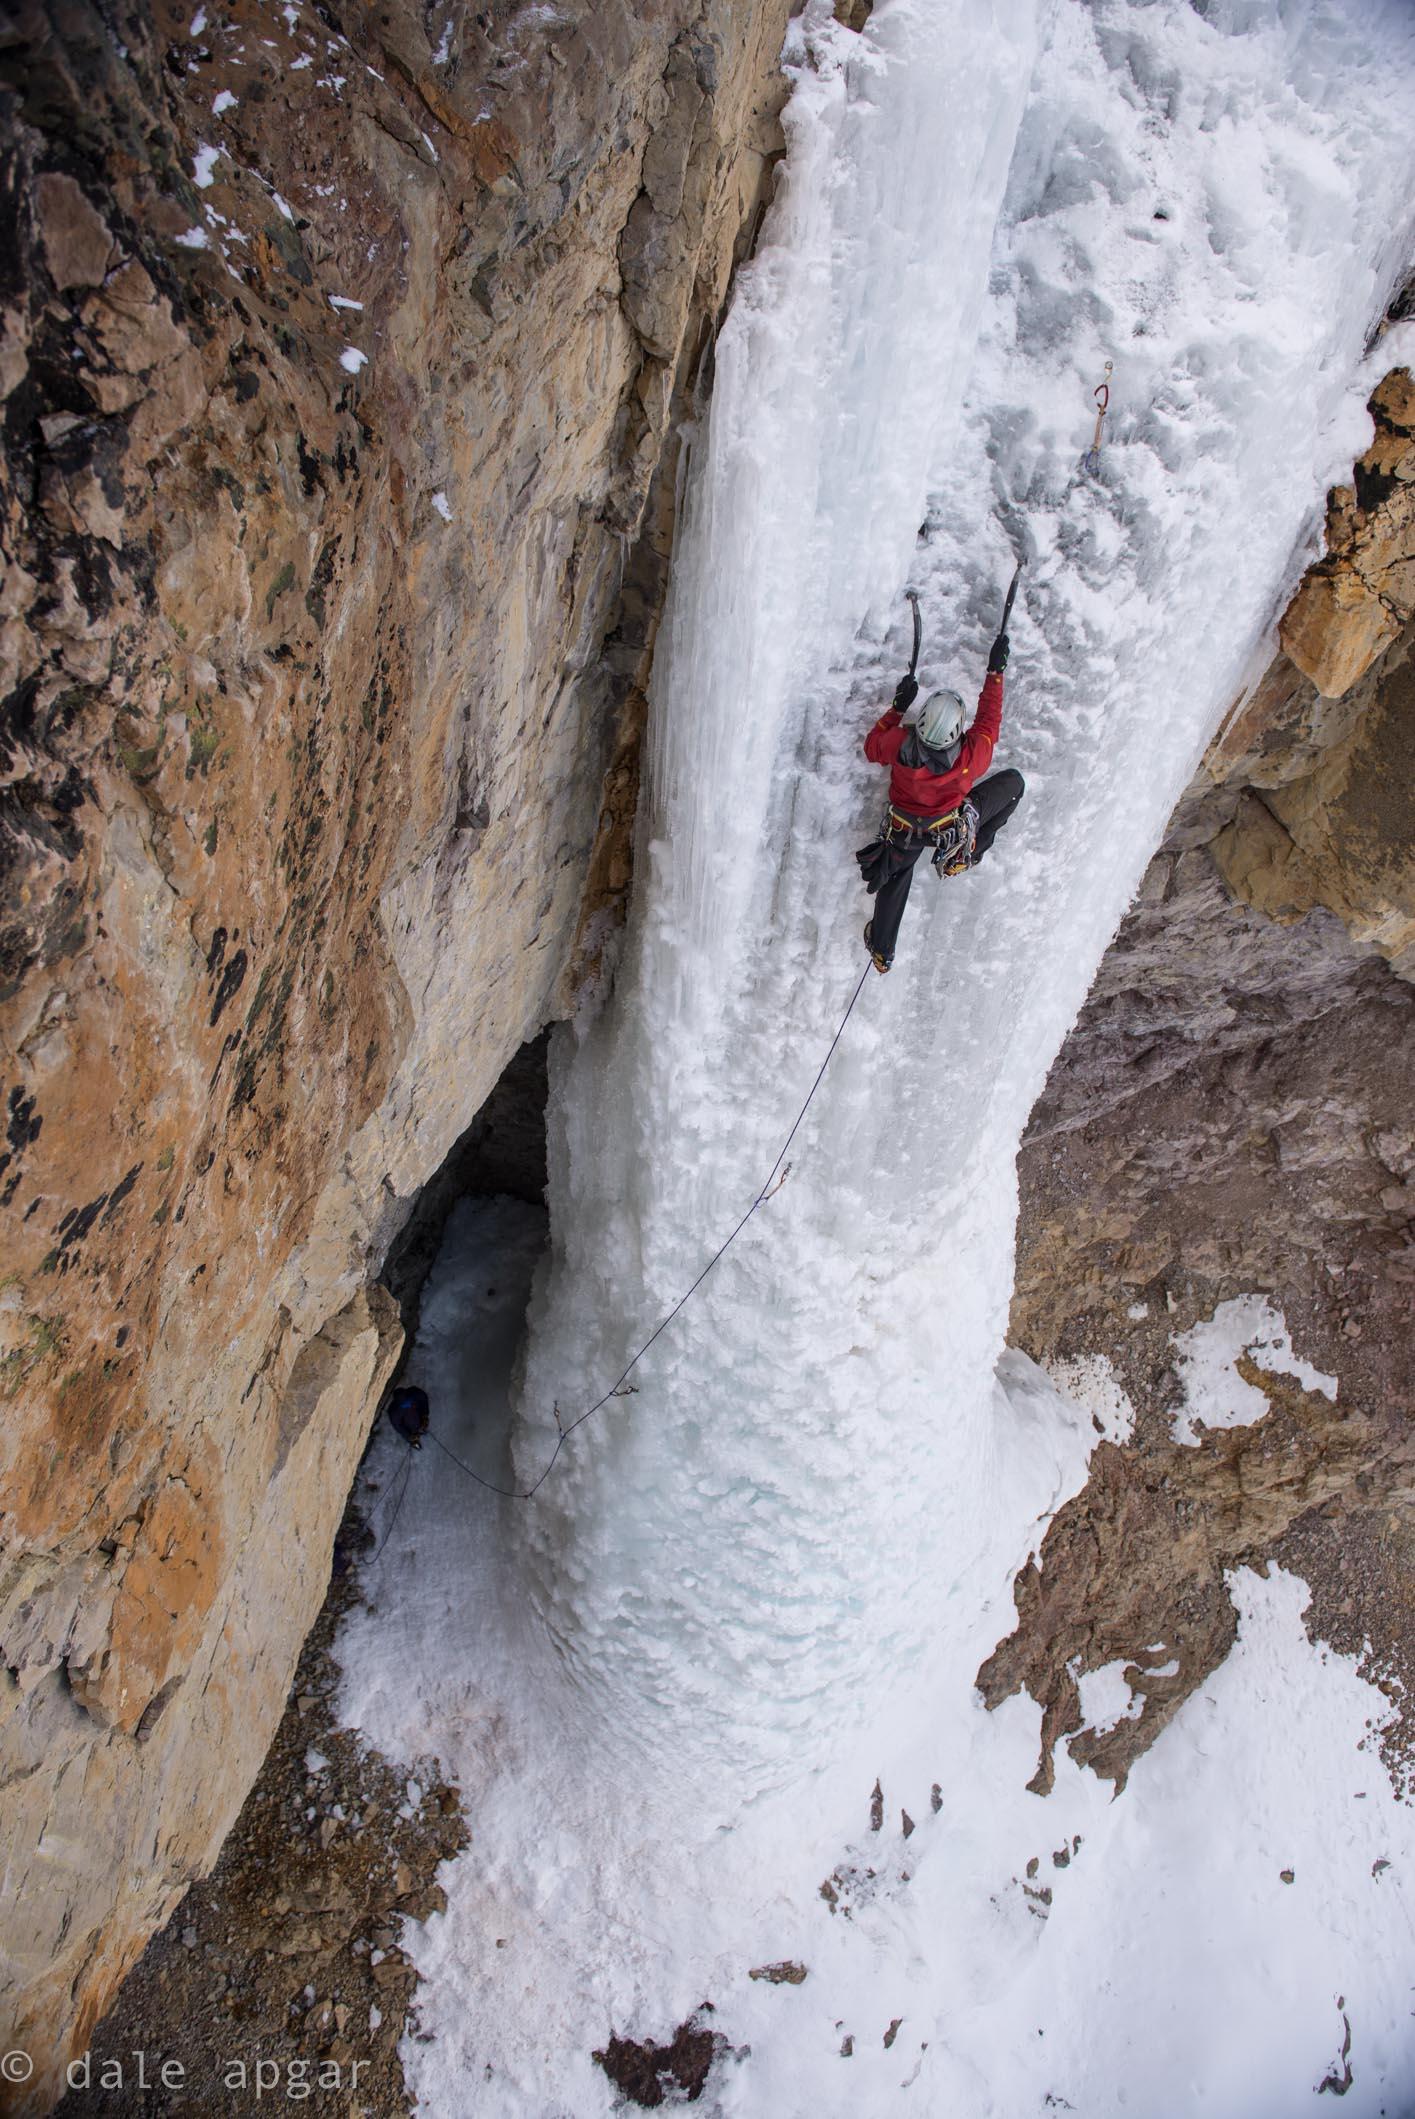 Drew Smith high on  Santa Claus Pillar